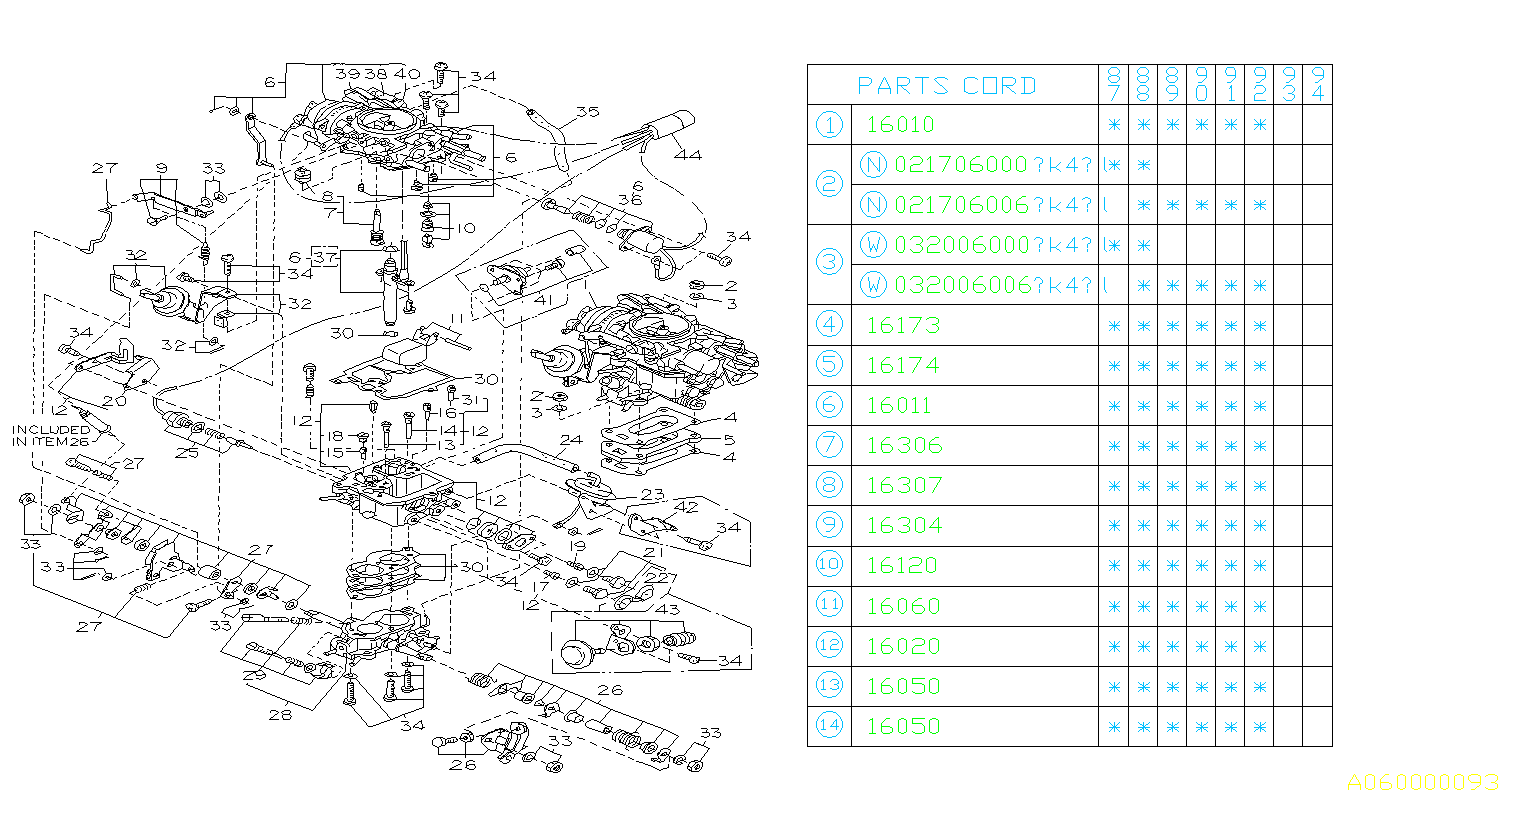 1987 Subaru Justy Float Set  Engine  Cooling  Carburetor